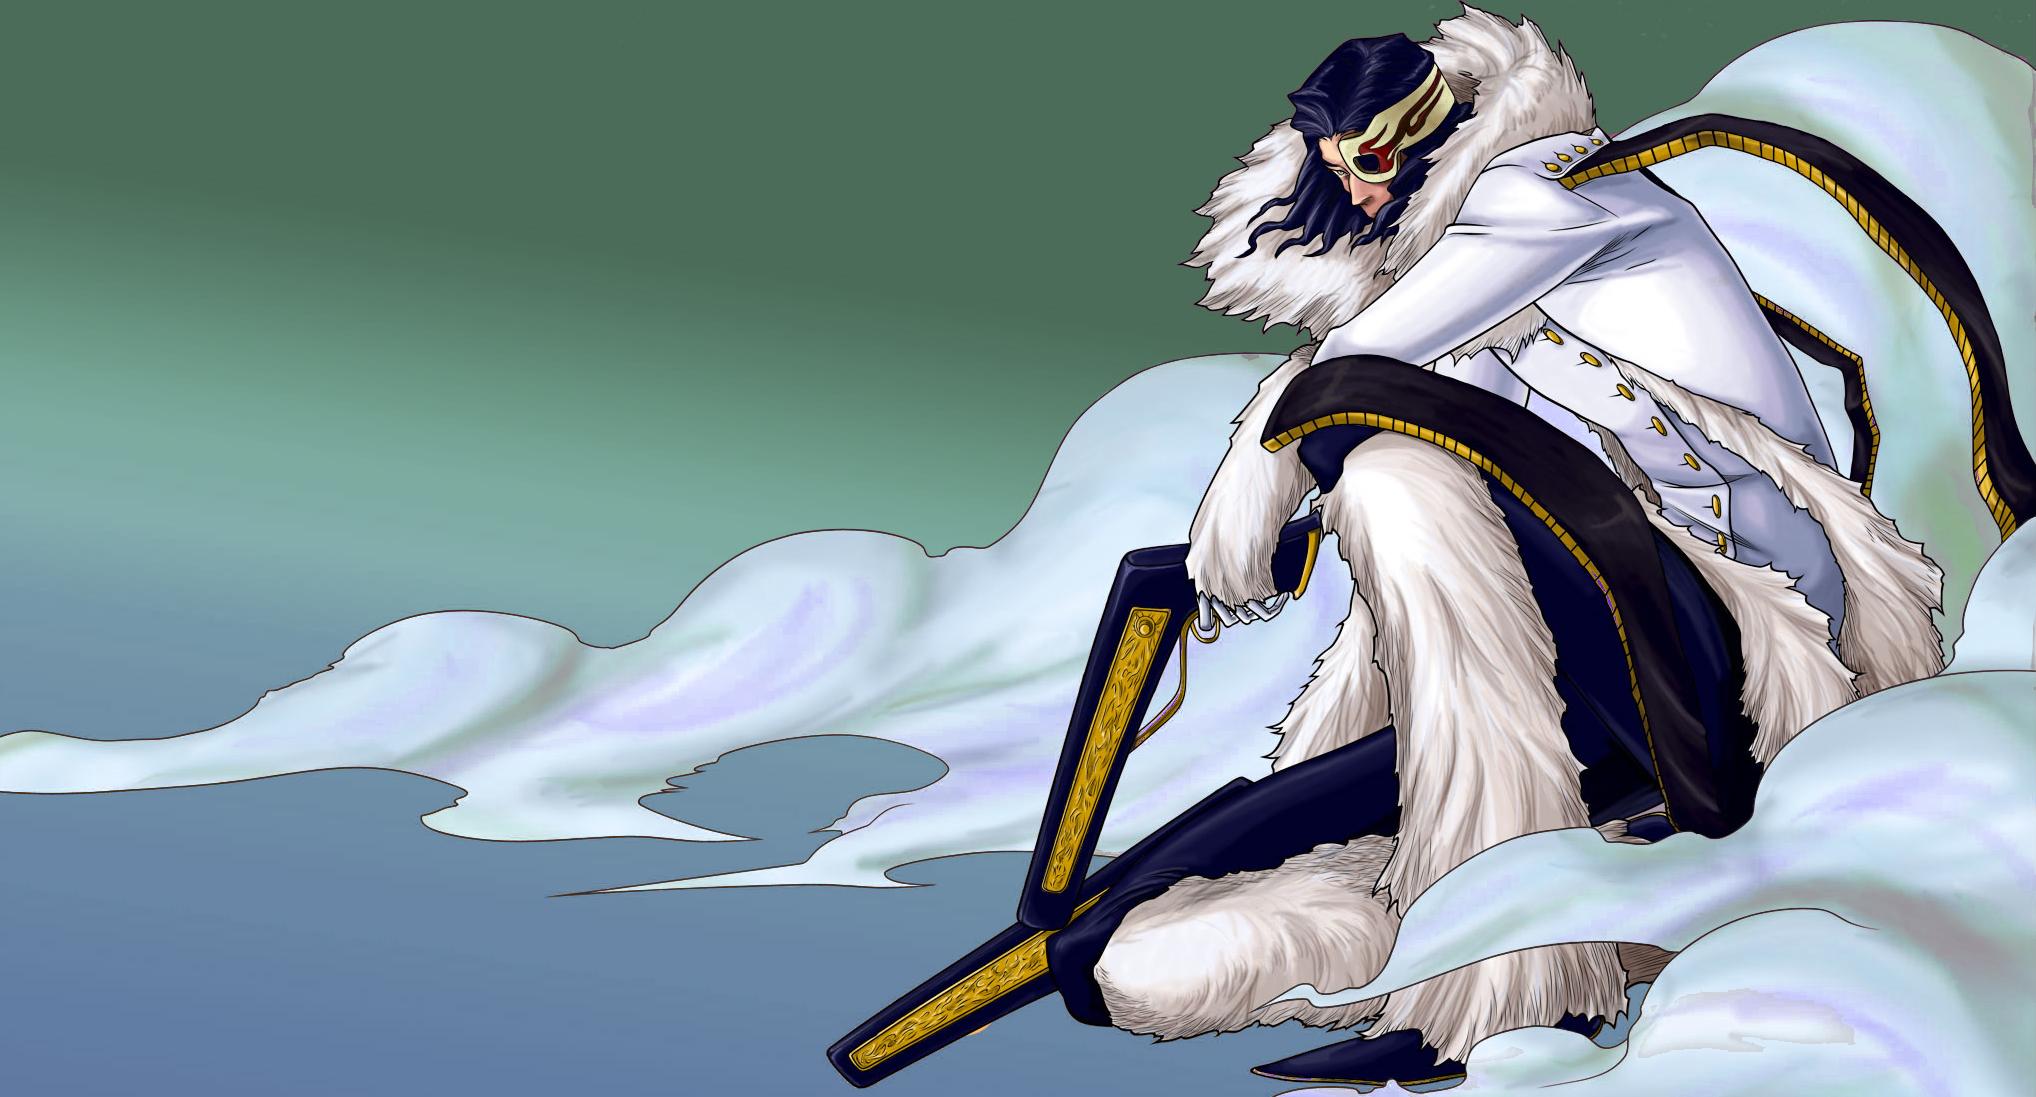 Bleach Espada Coyote Stark